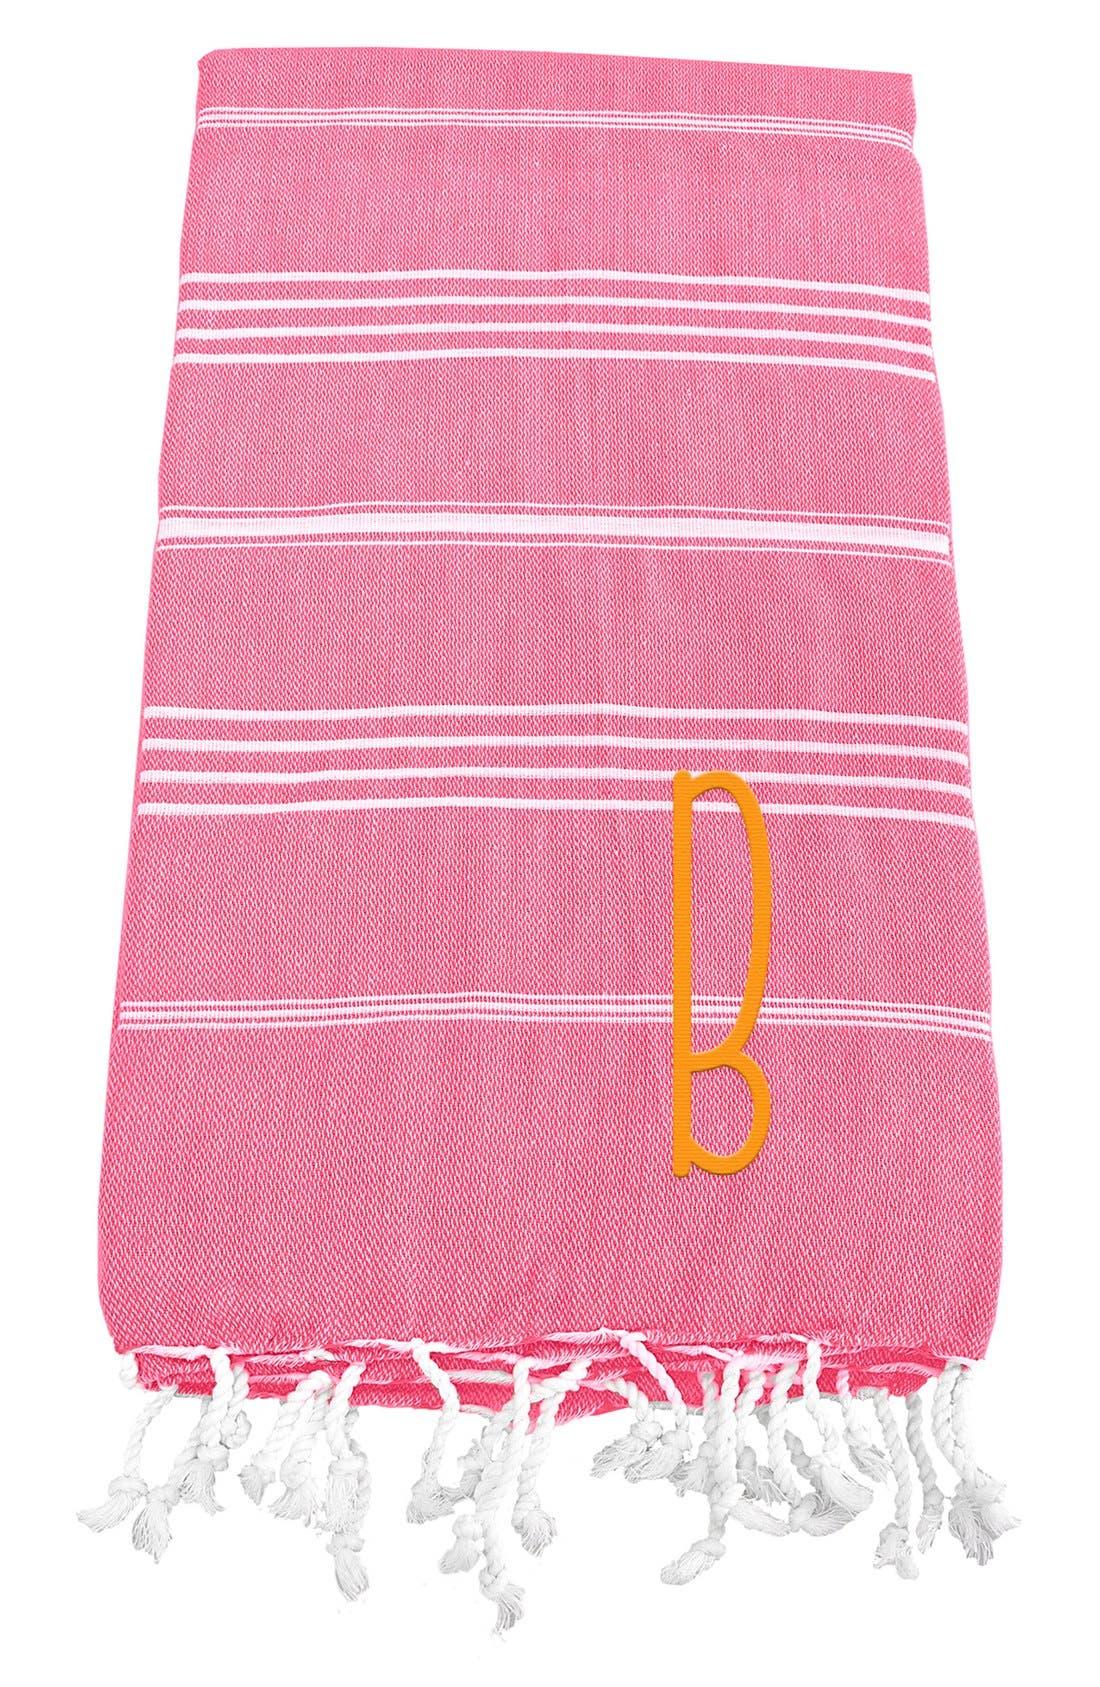 Monogram Turkish Cotton Towel,                             Main thumbnail 138, color,